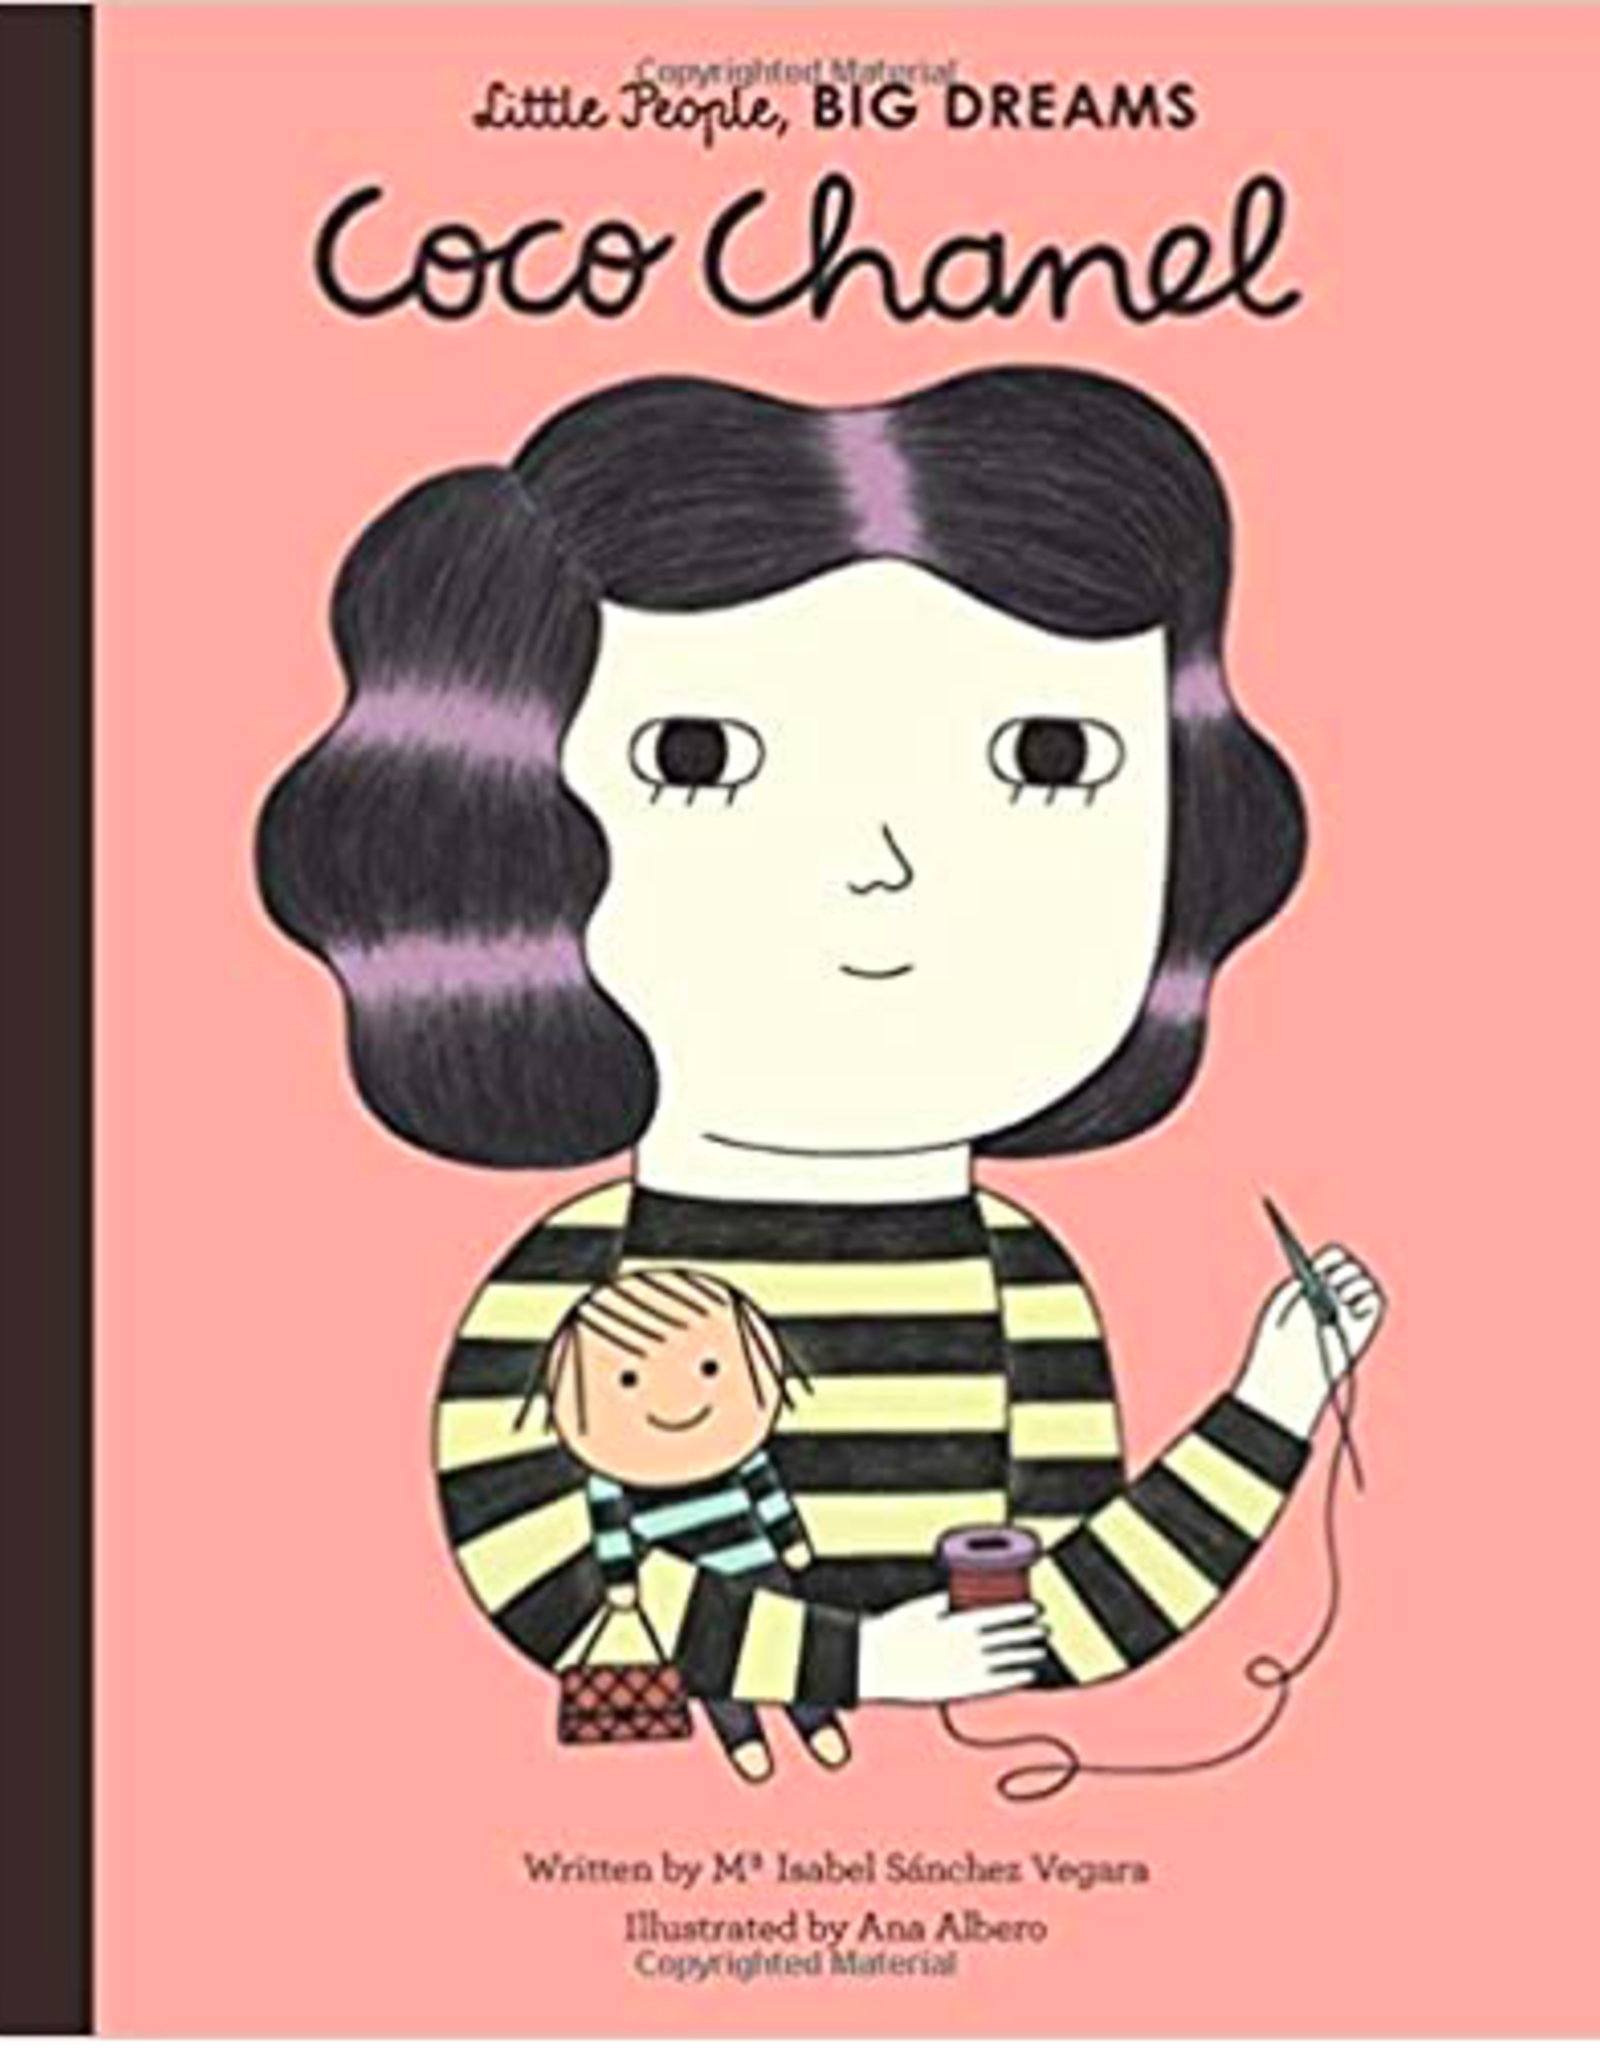 Harper Little People, Big Dreams - Coco Chanel